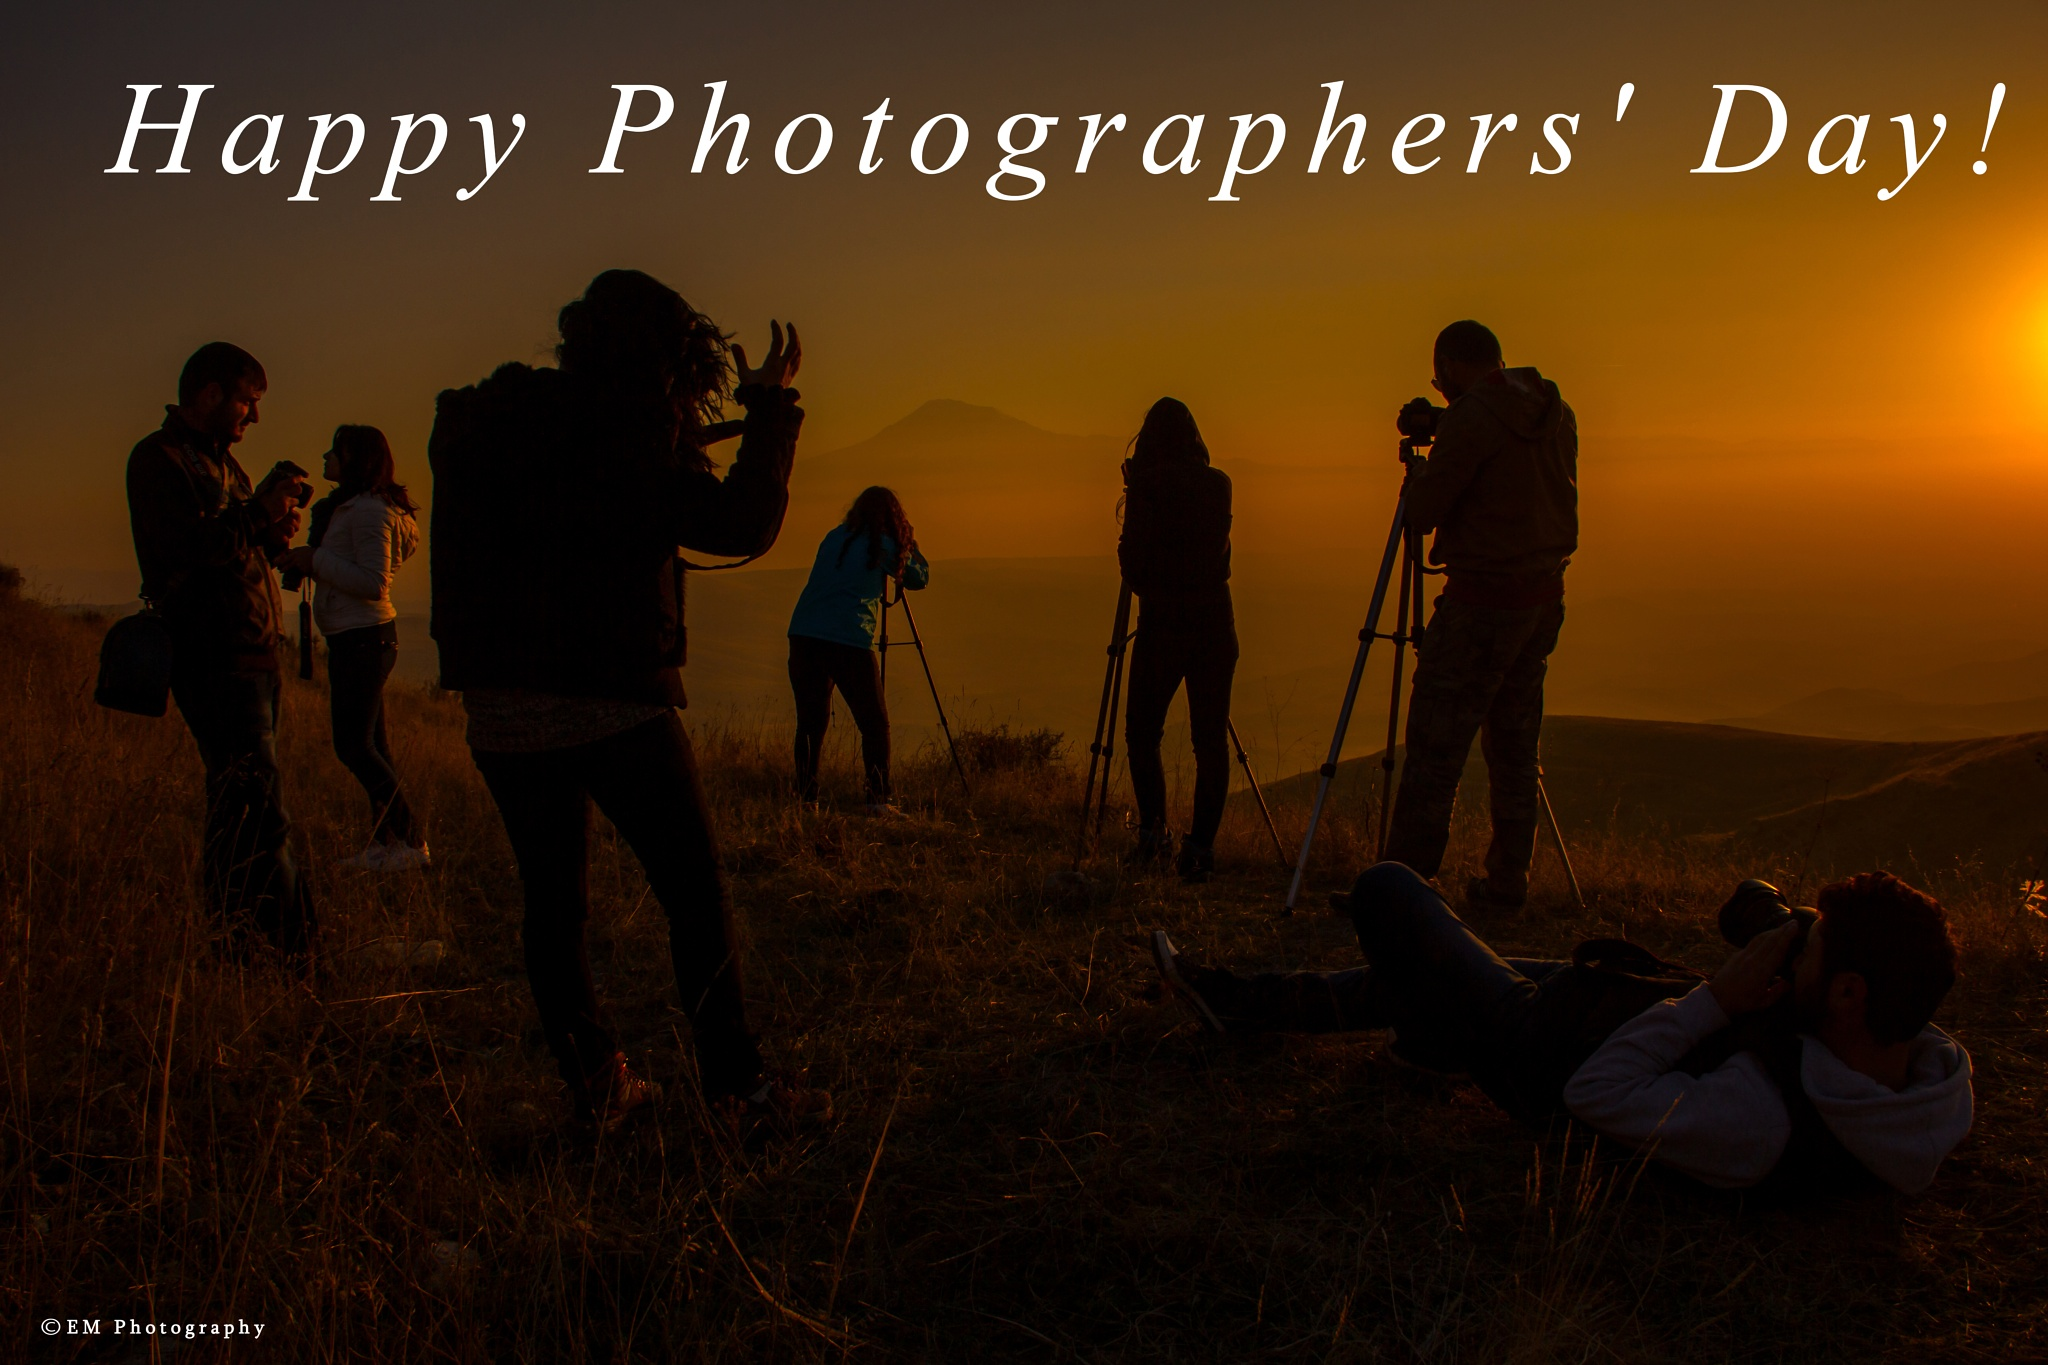 Happy Photographers' Day! by Edgar Martirosyan